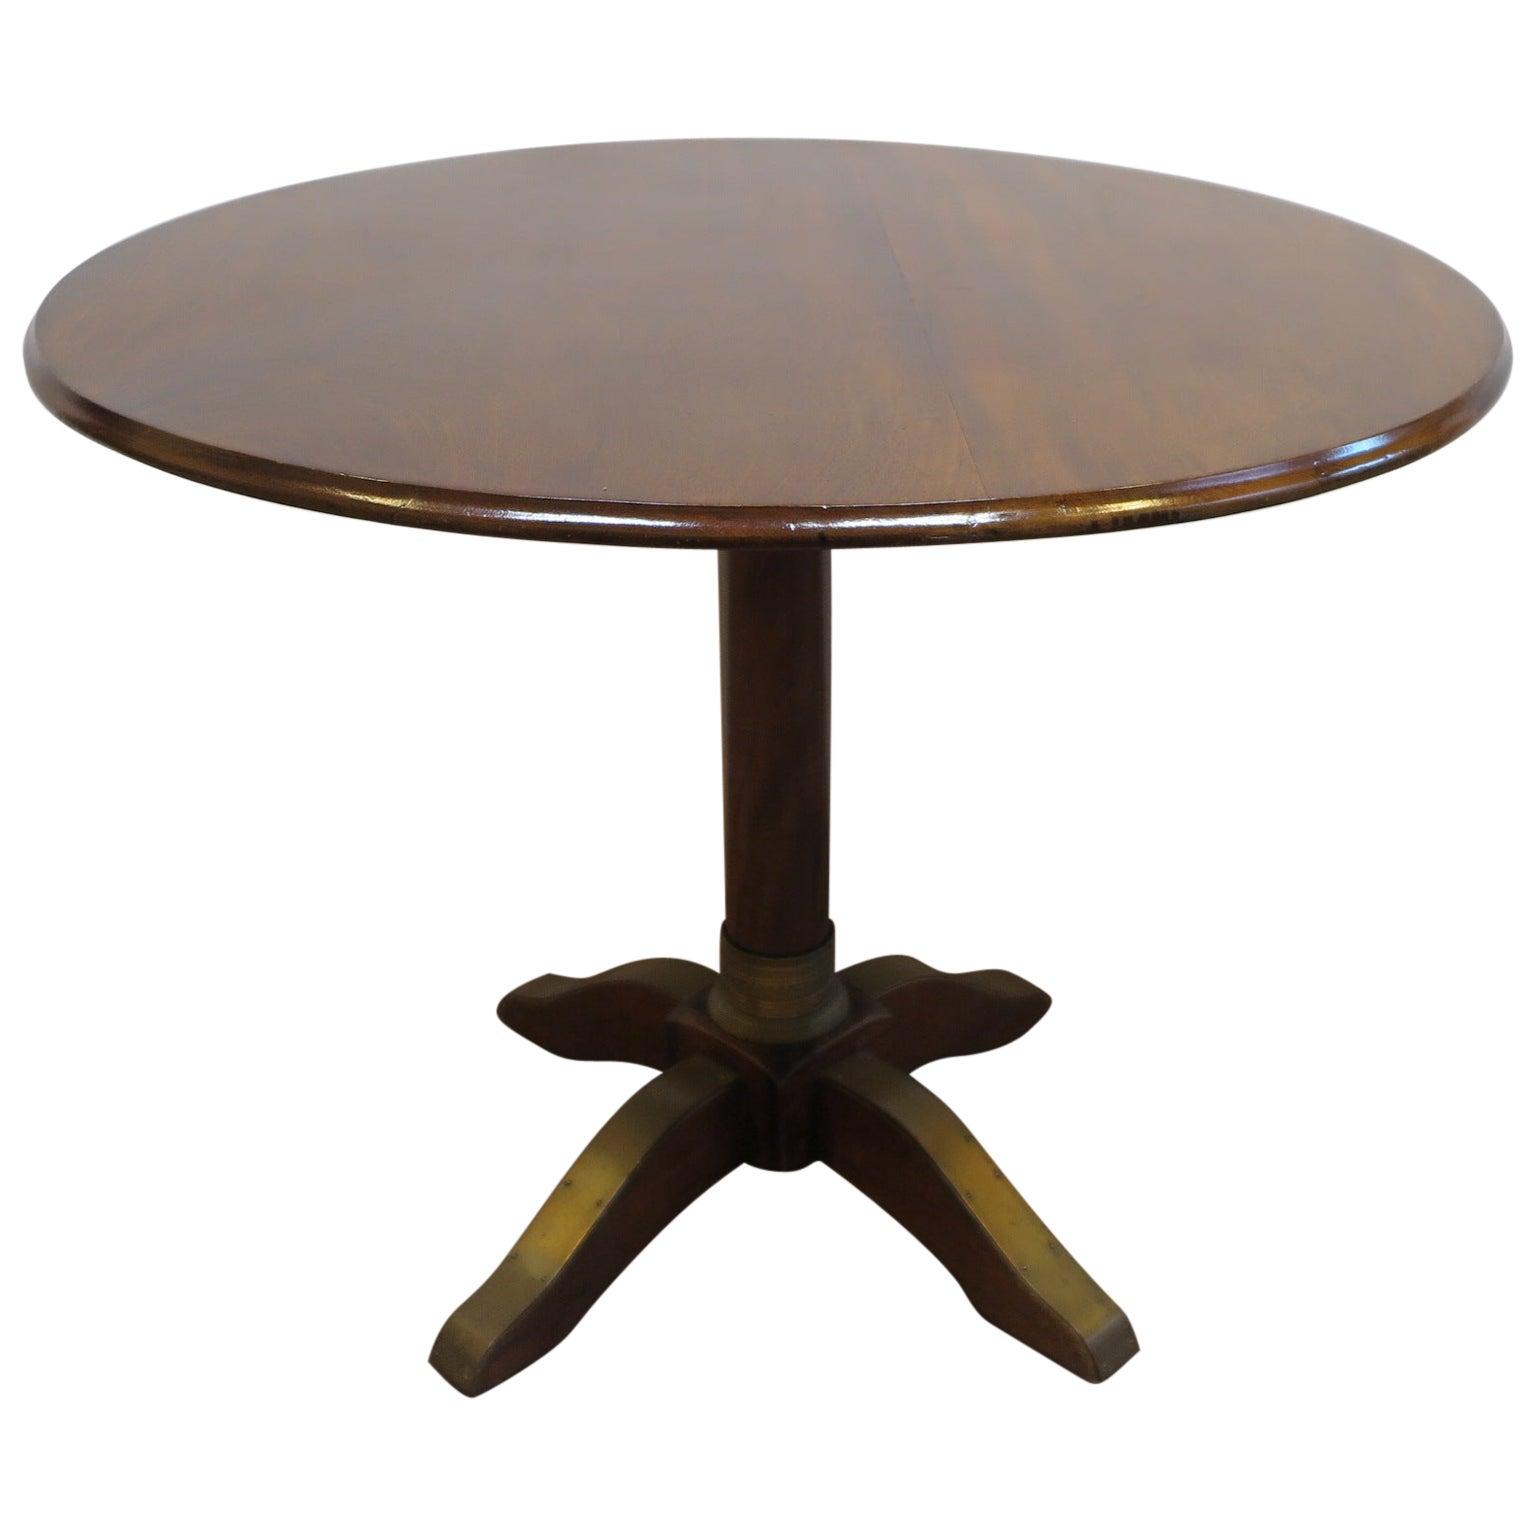 19th Century French Guéridon Hall Table